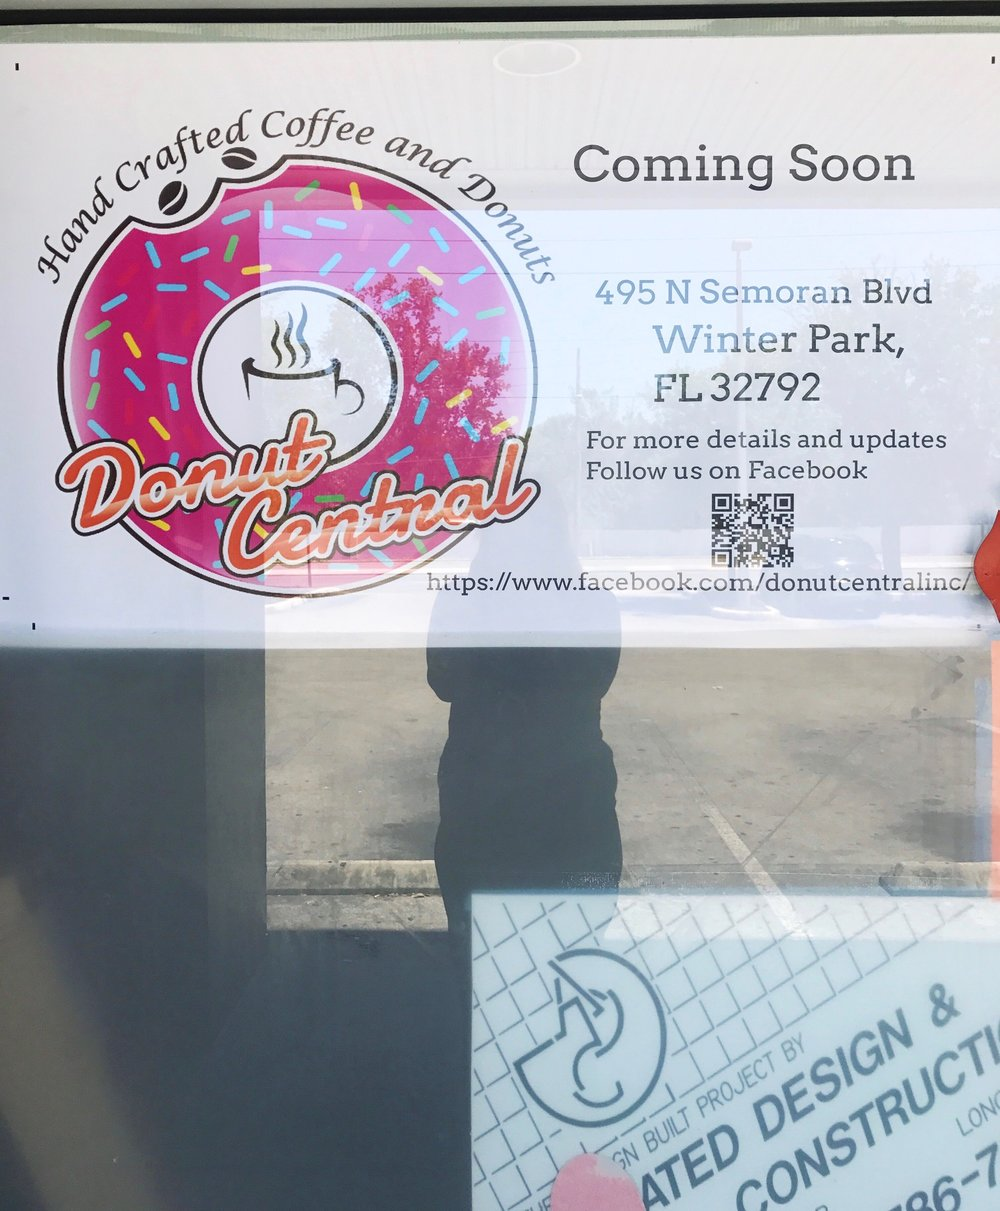 DonutCreative_Donuts_Storefront_Orlando.jpg